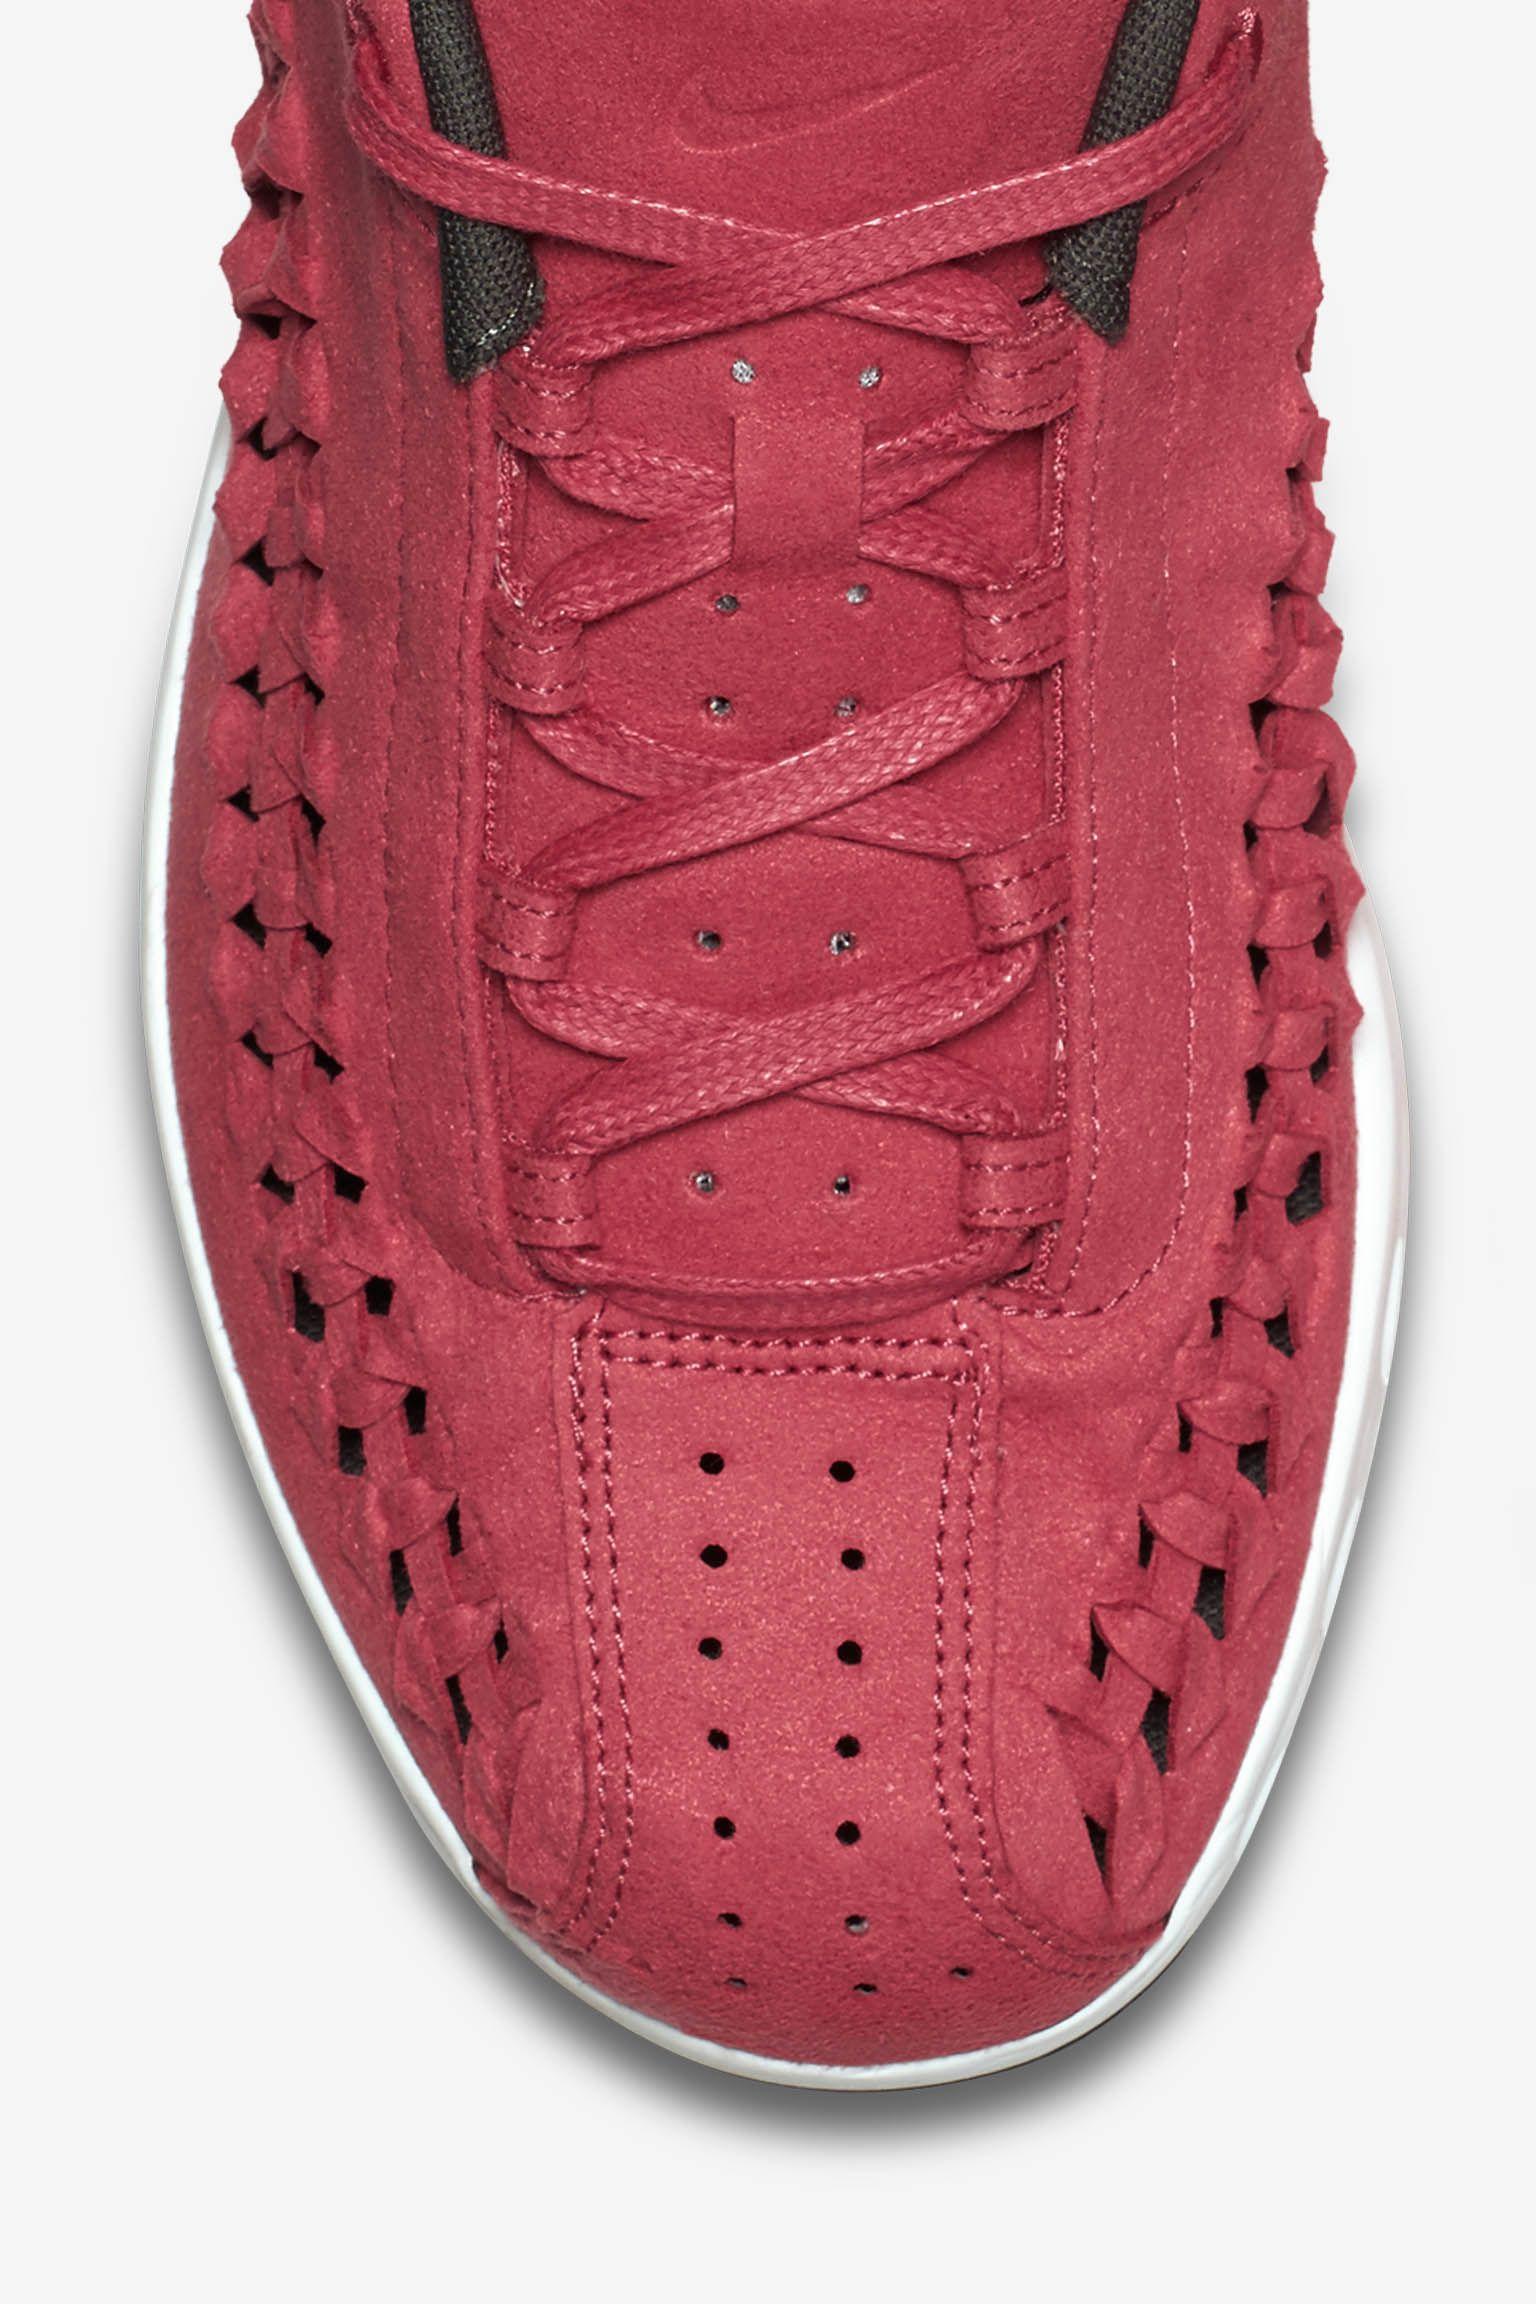 Nike Mayfly Woven 'Terra Red'